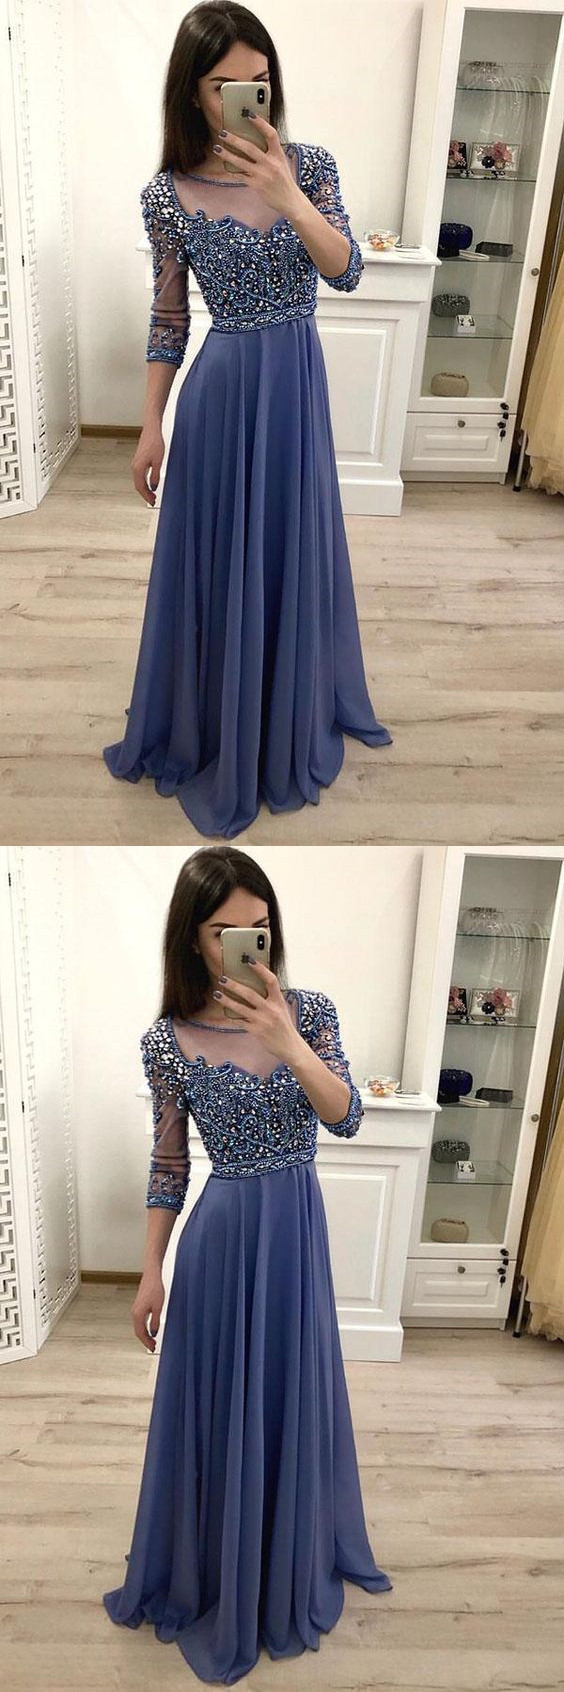 Elegant Round Neck Chiffon 3/4 Sleeves Prom Dresses with Beading